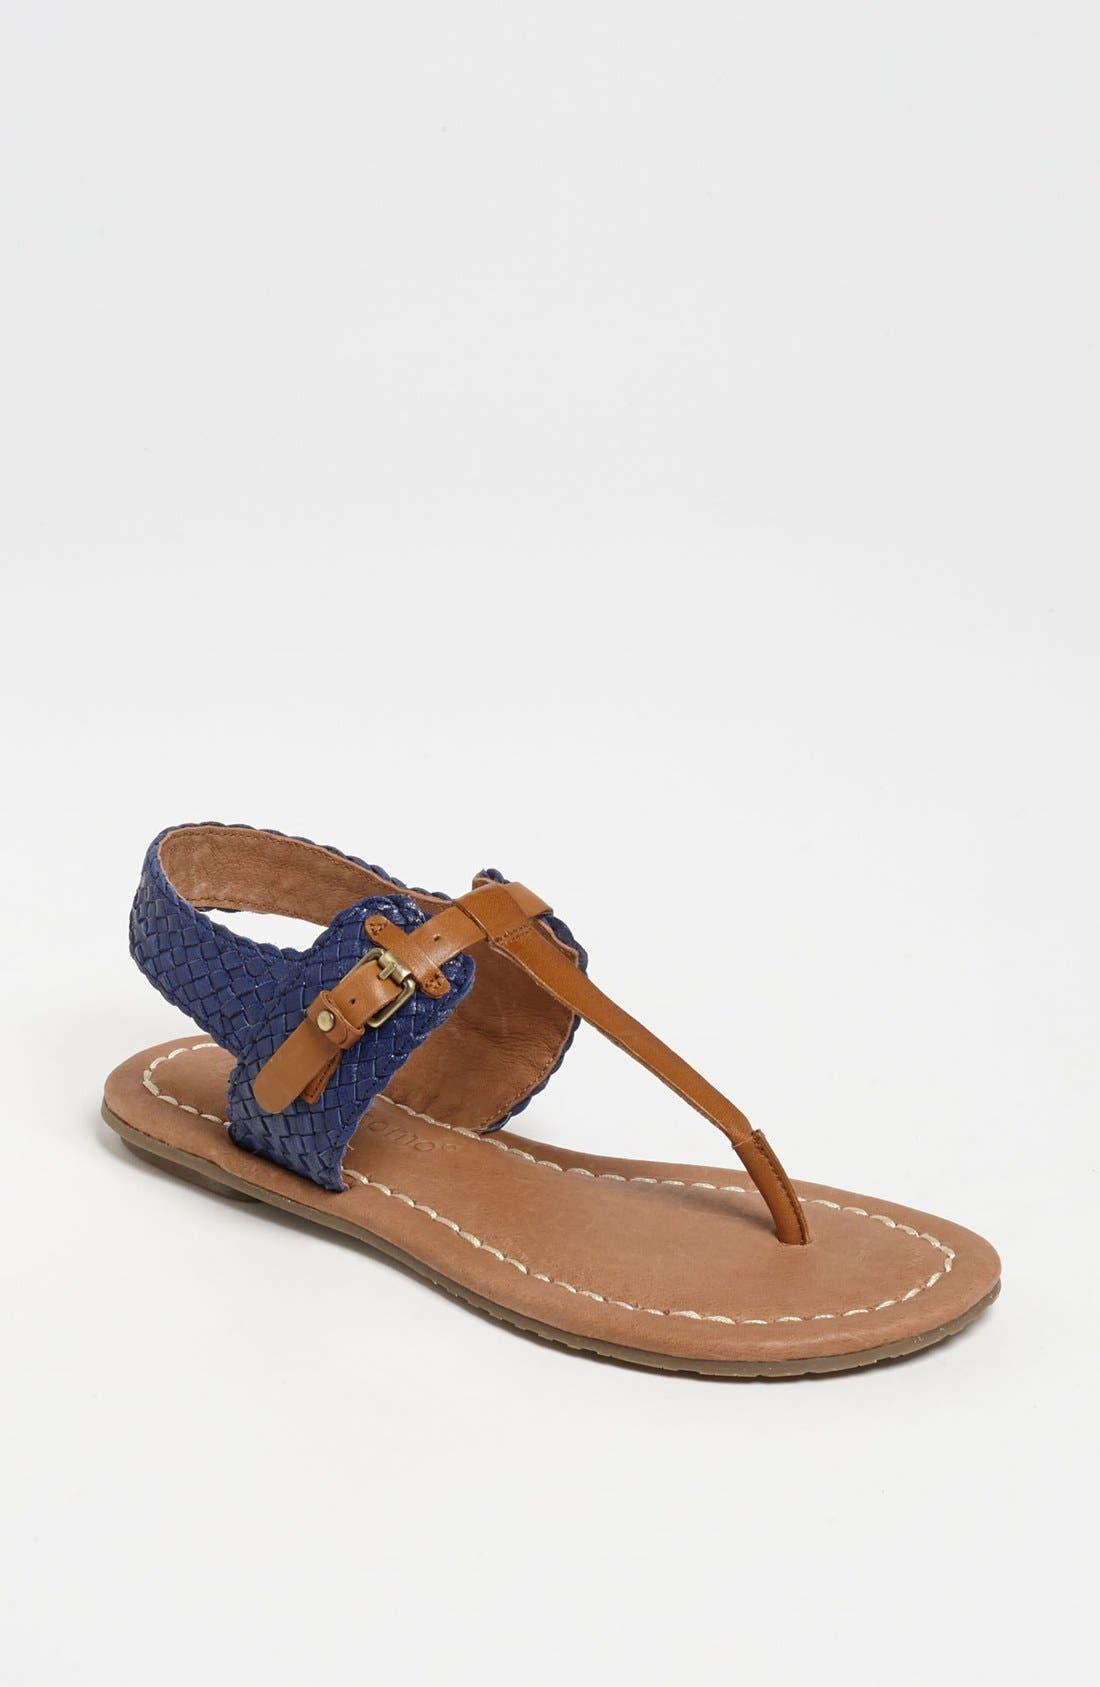 Main Image - Corso Como 'Behave' Sandal